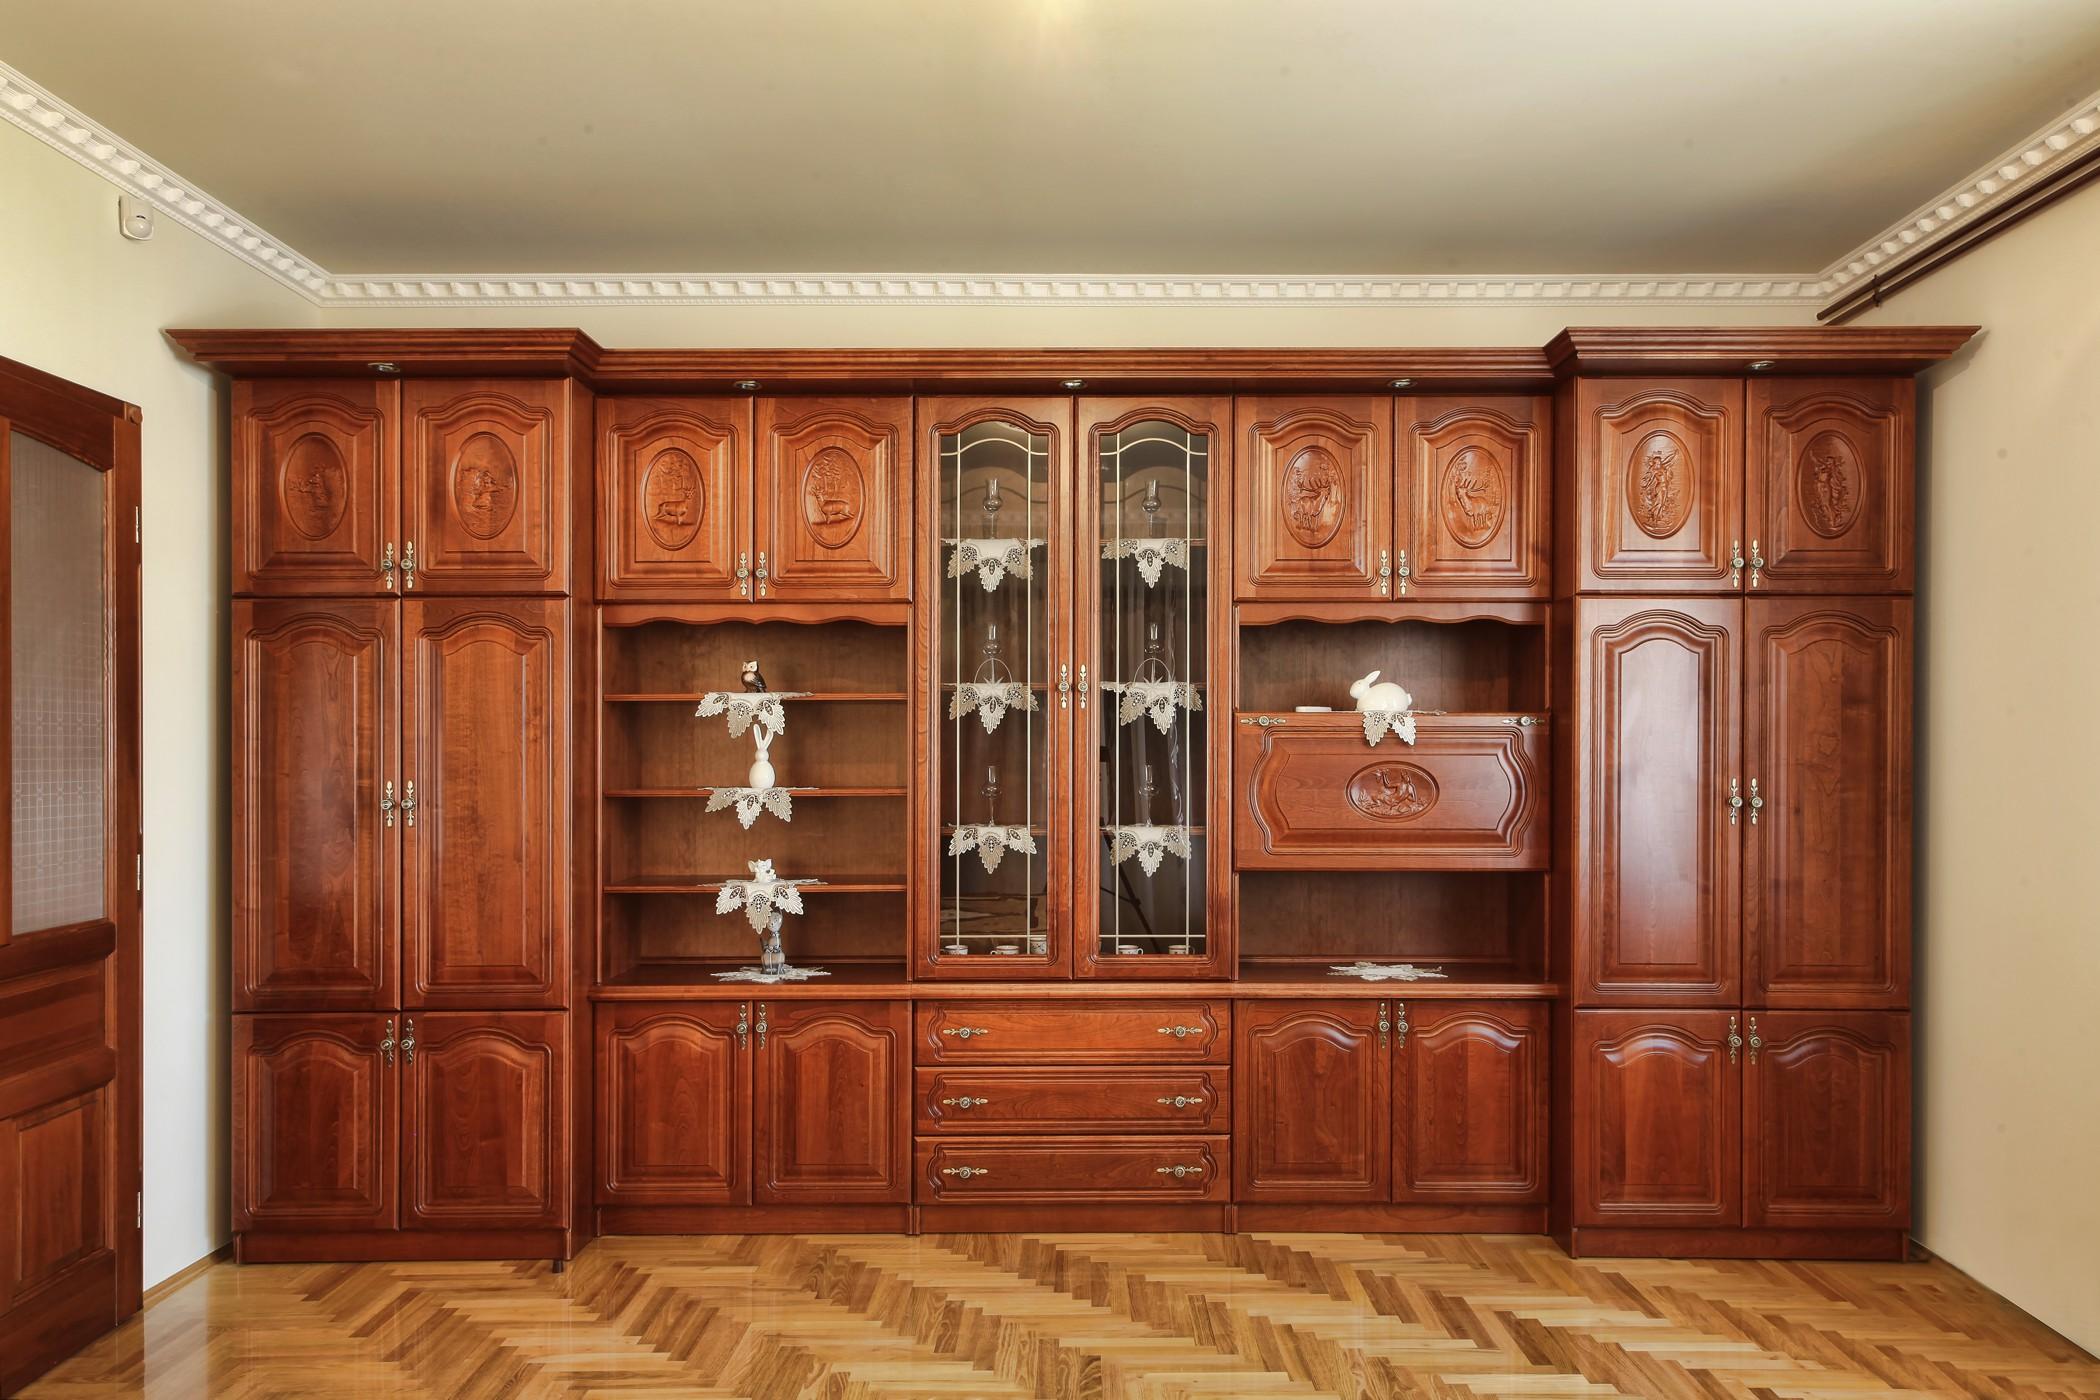 Klasszikus bútorok és klasszikus stílus mindörökké